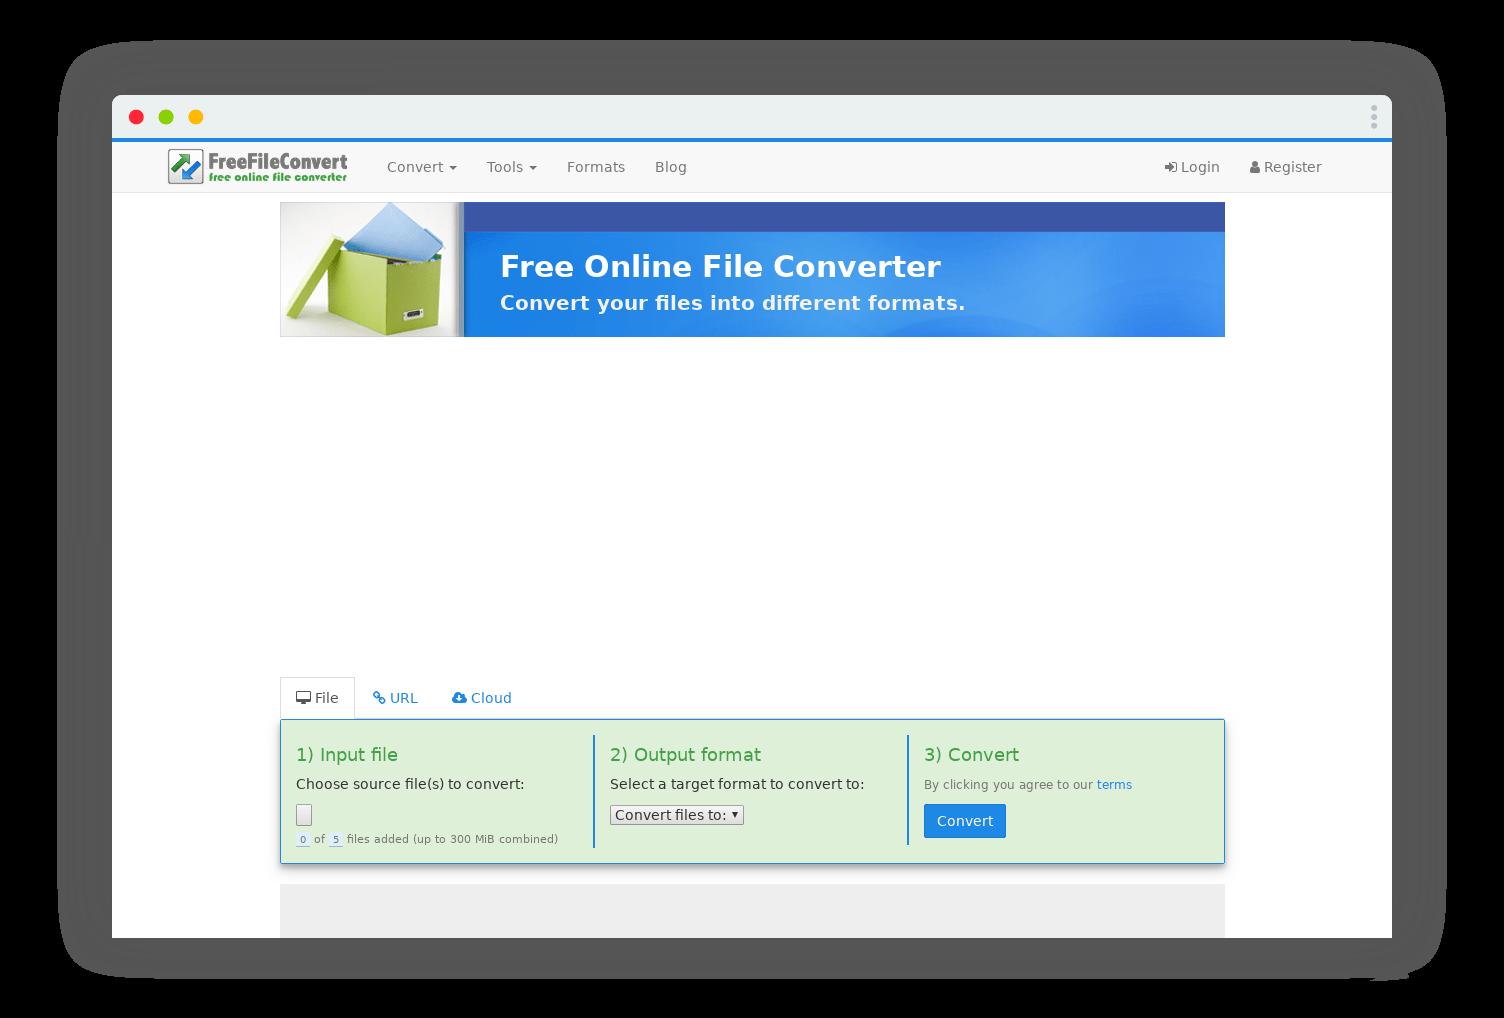 freefileconvert conversion format